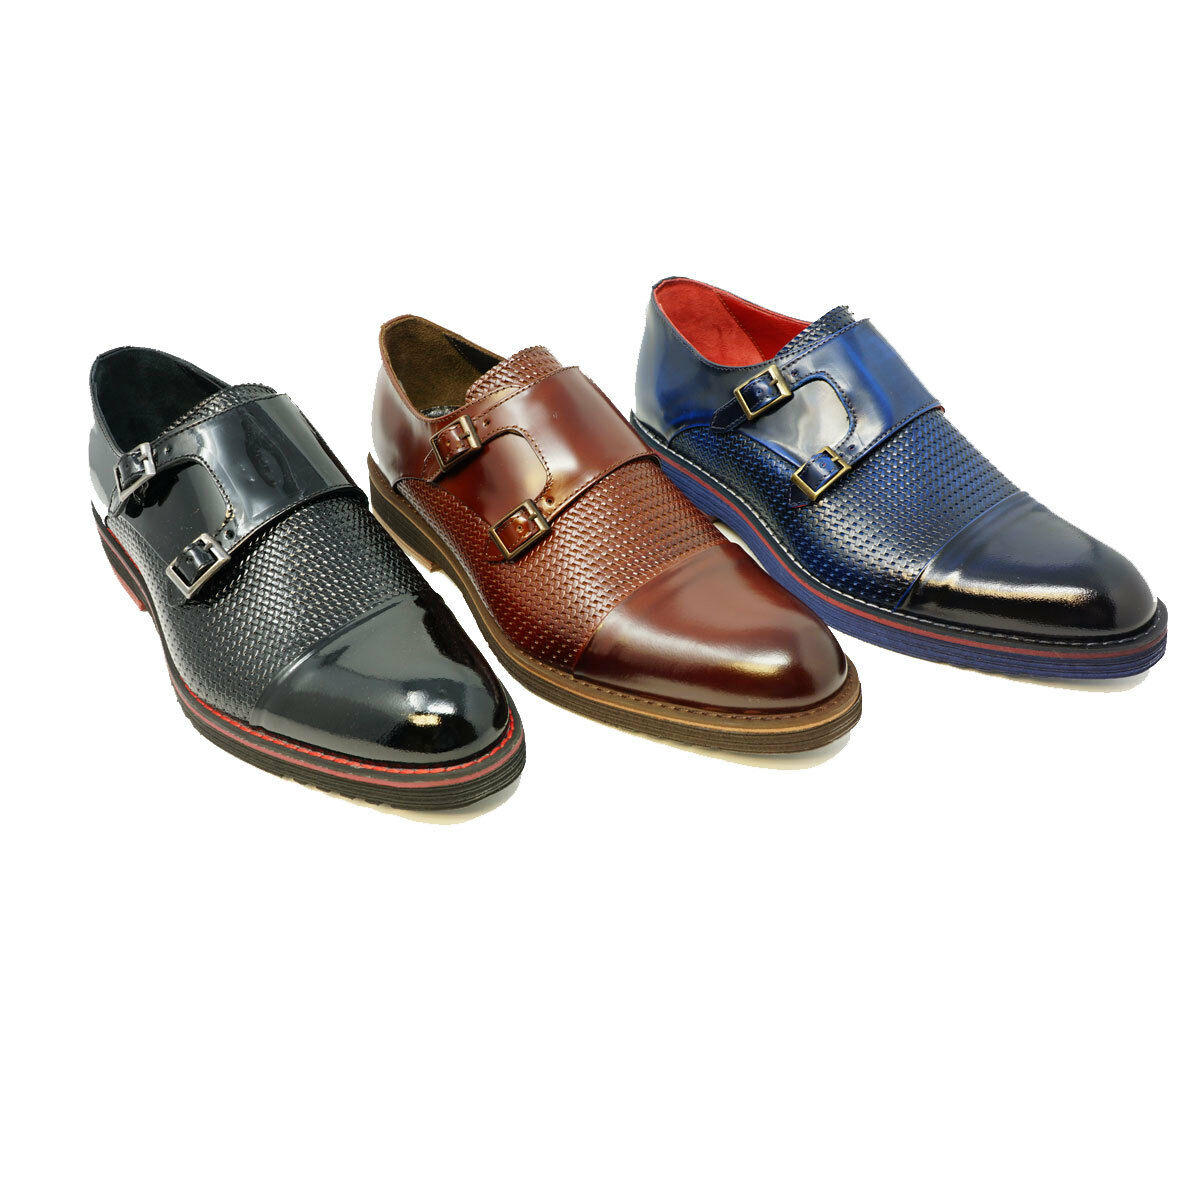 69ee6e1e9be Futoli Futoli Futoli Men 100% Genuine Leather Double Monk Fahsion Dress  shoes Handmade bd4a3d